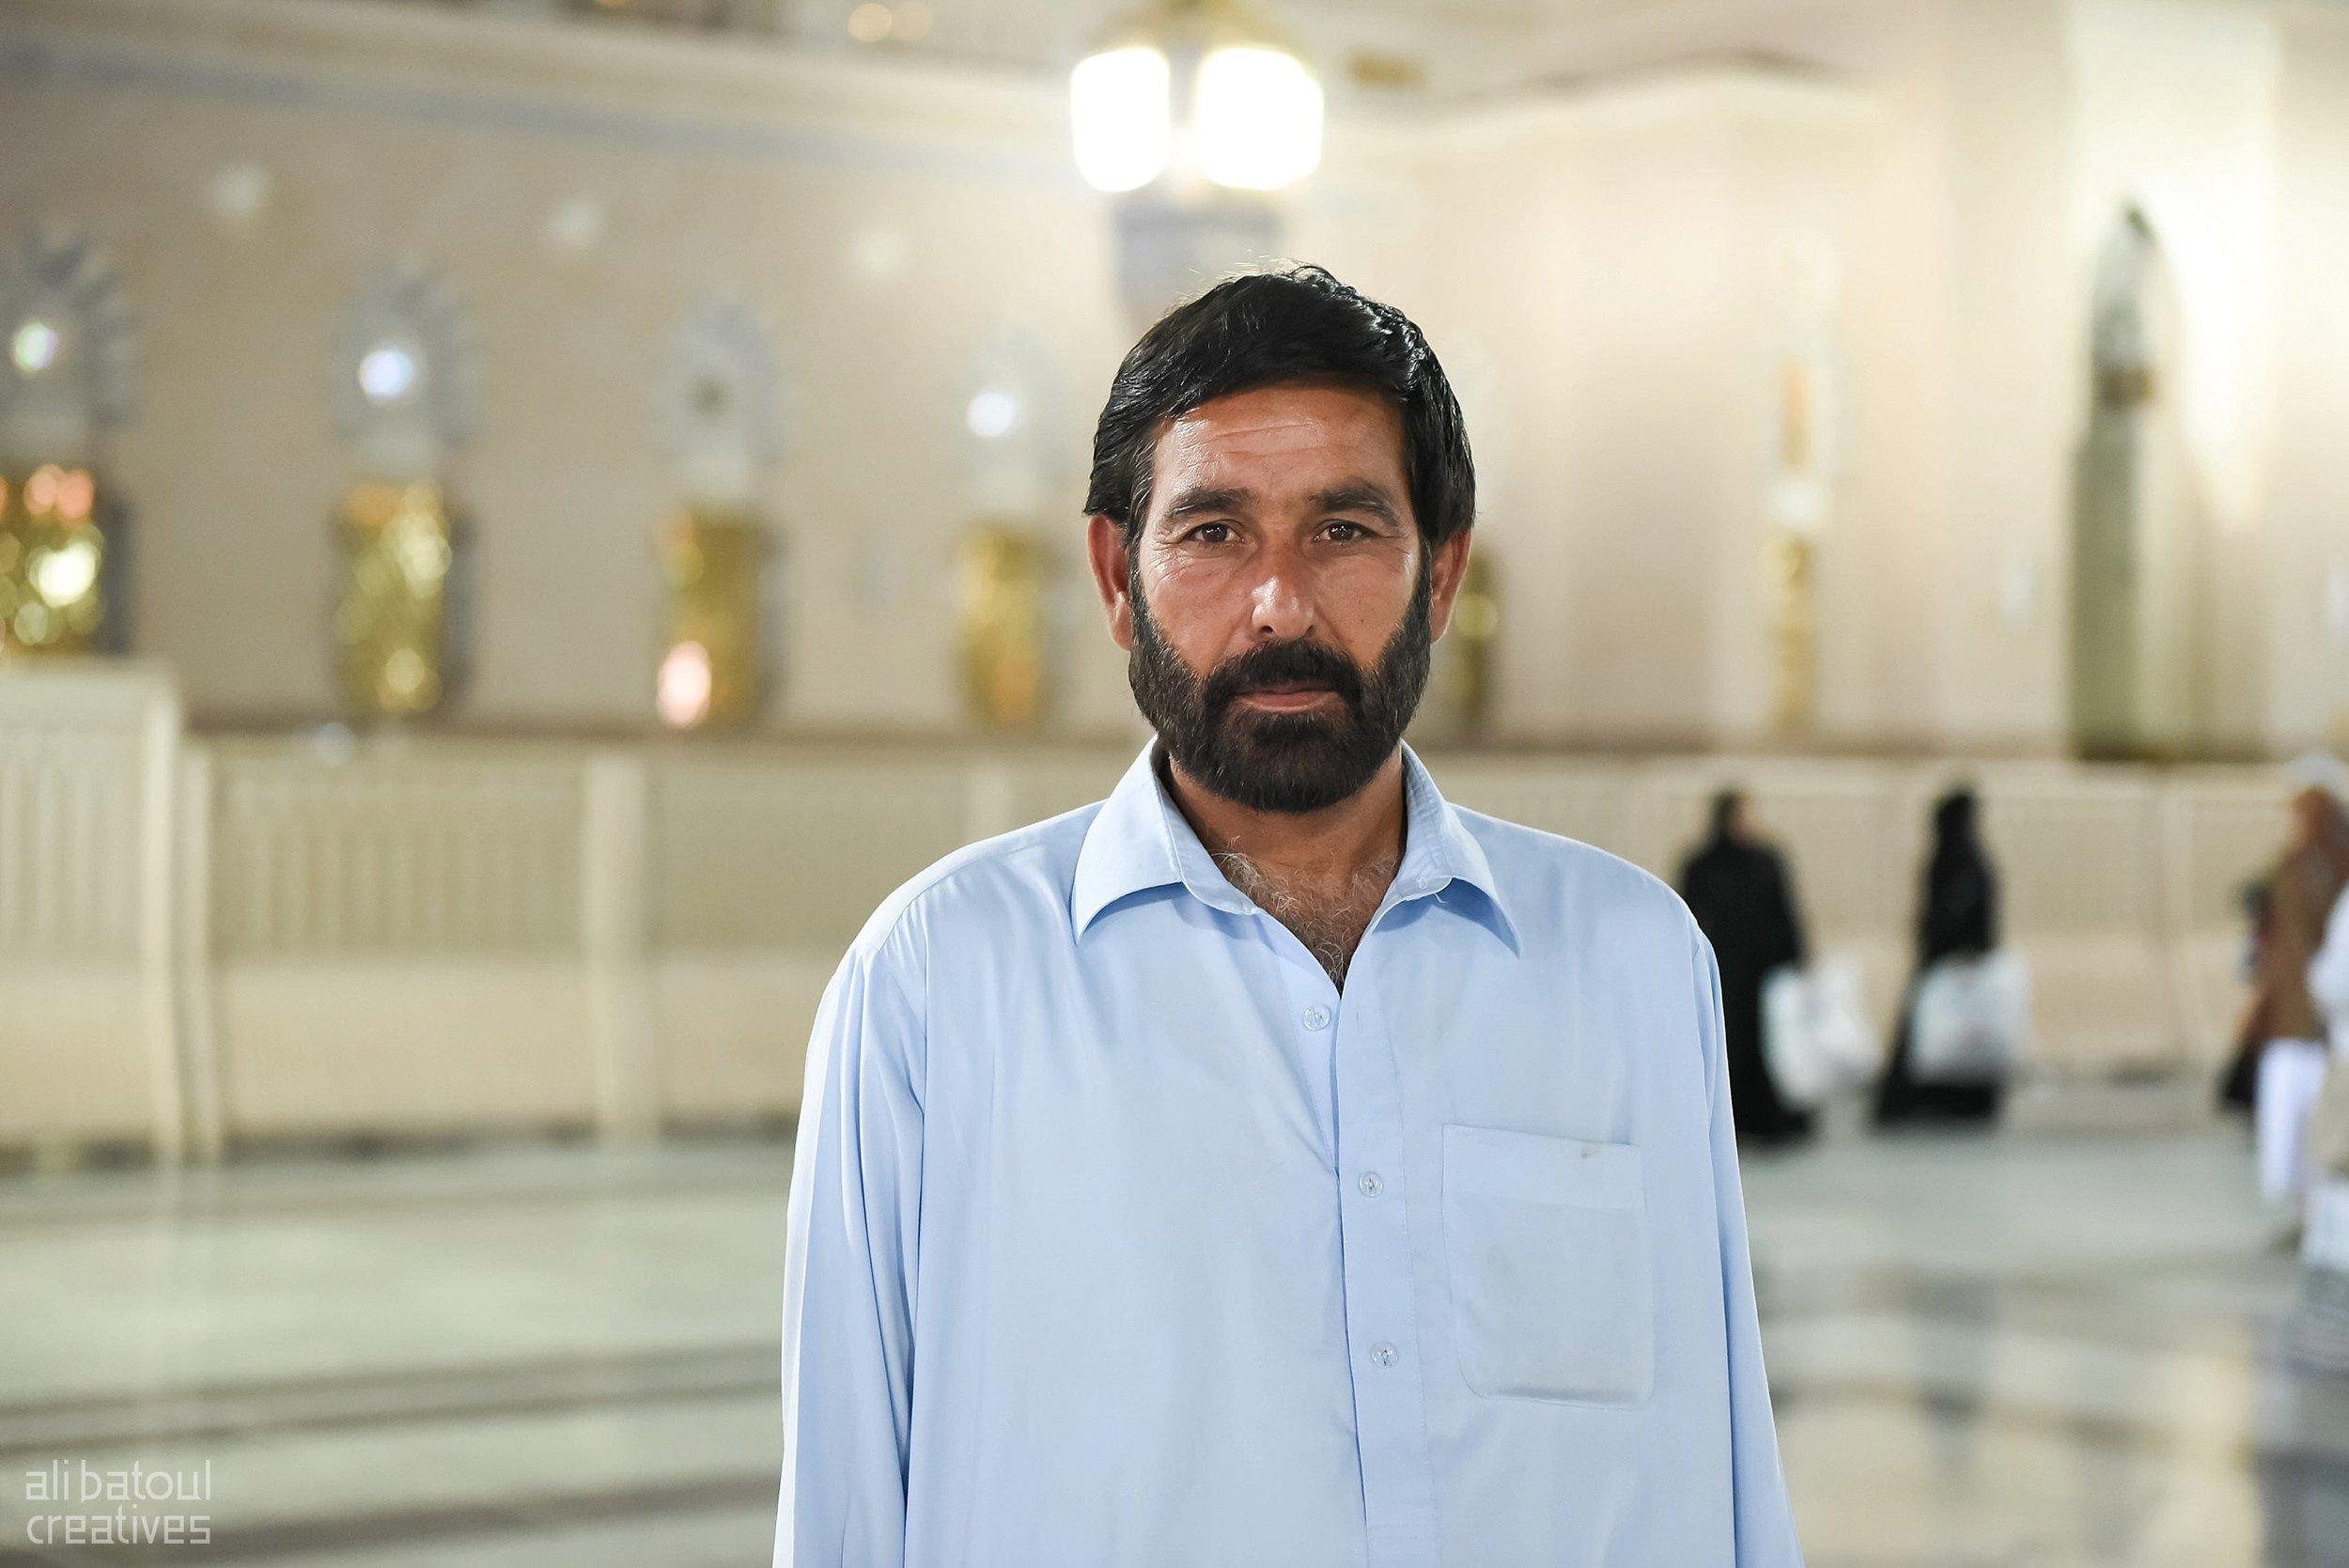 Umrah 2015 (Medina) - Ali Batoul Creatives-7_Stomped.jpg